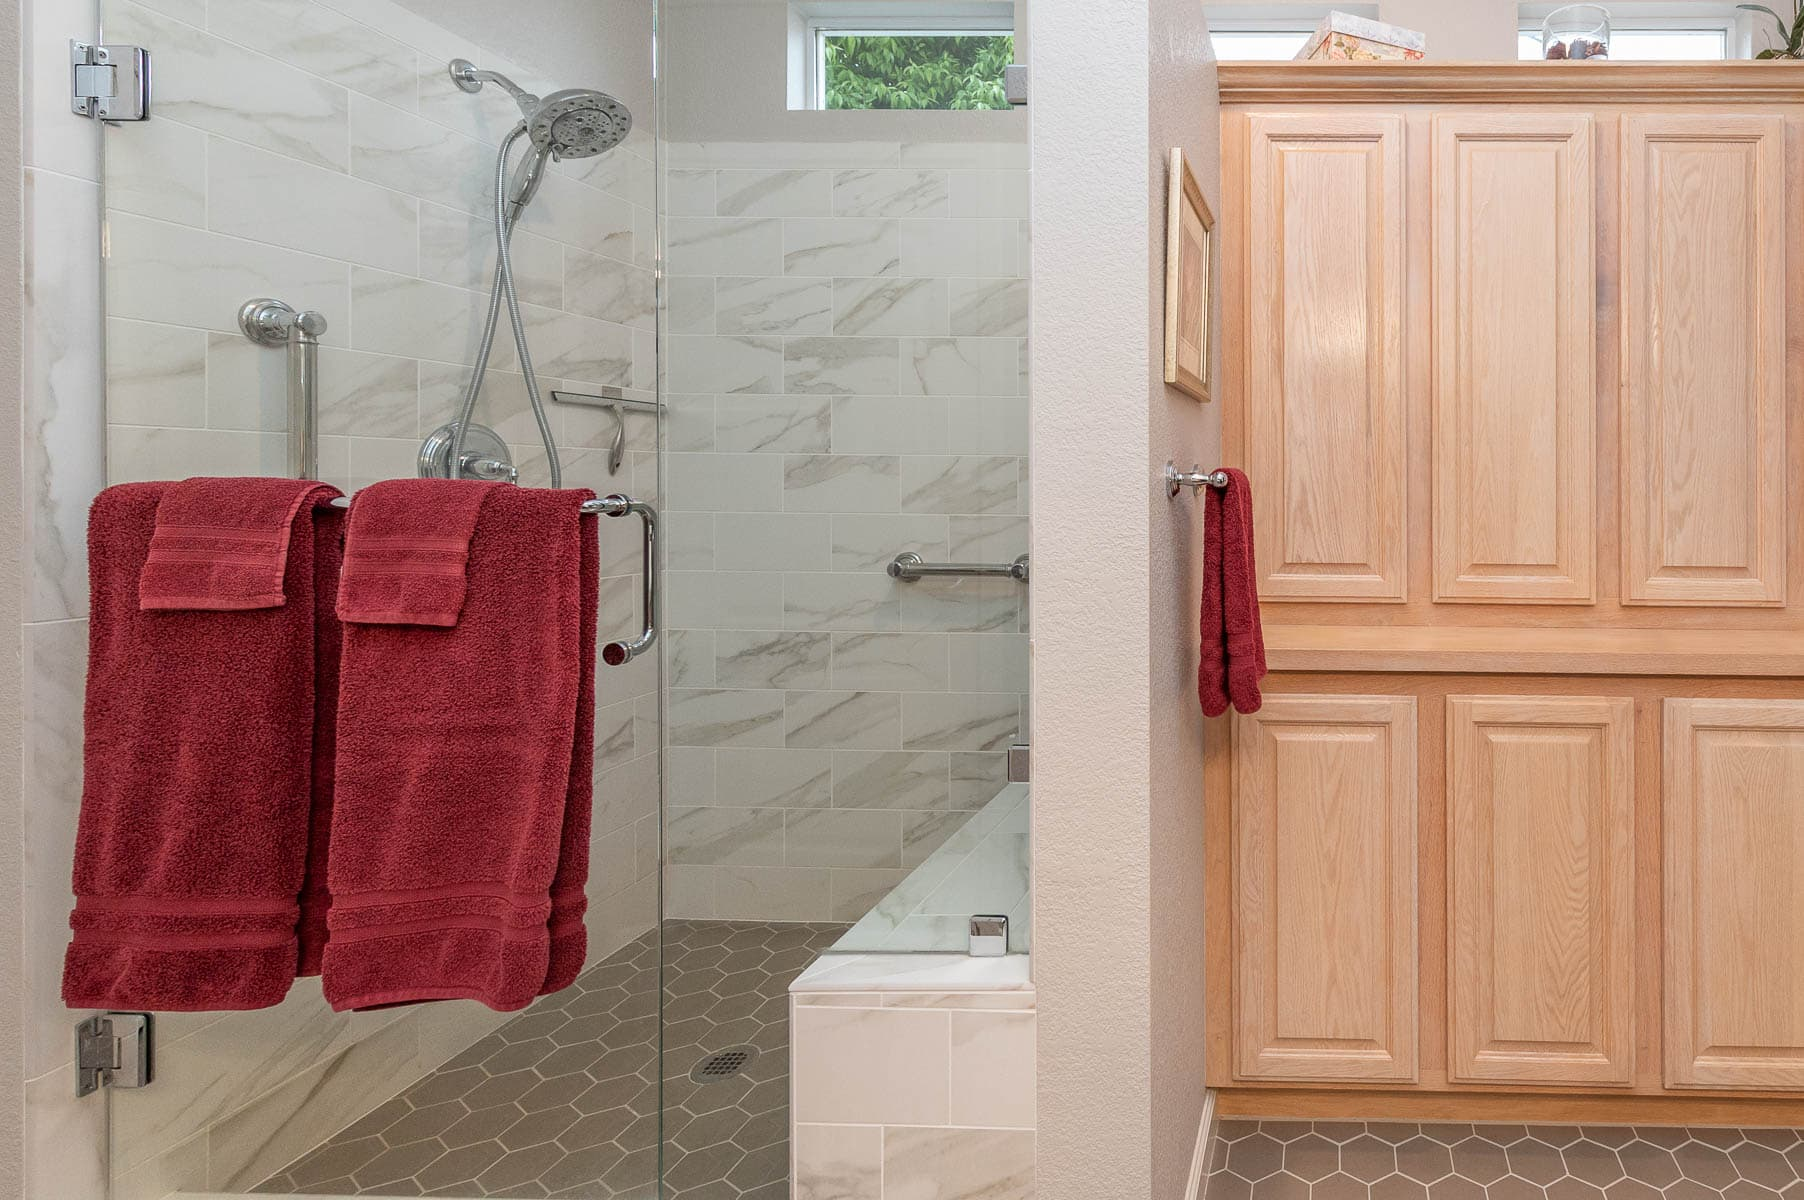 Bathroom remodel in Del Webb Community in Cloverdale, CA.